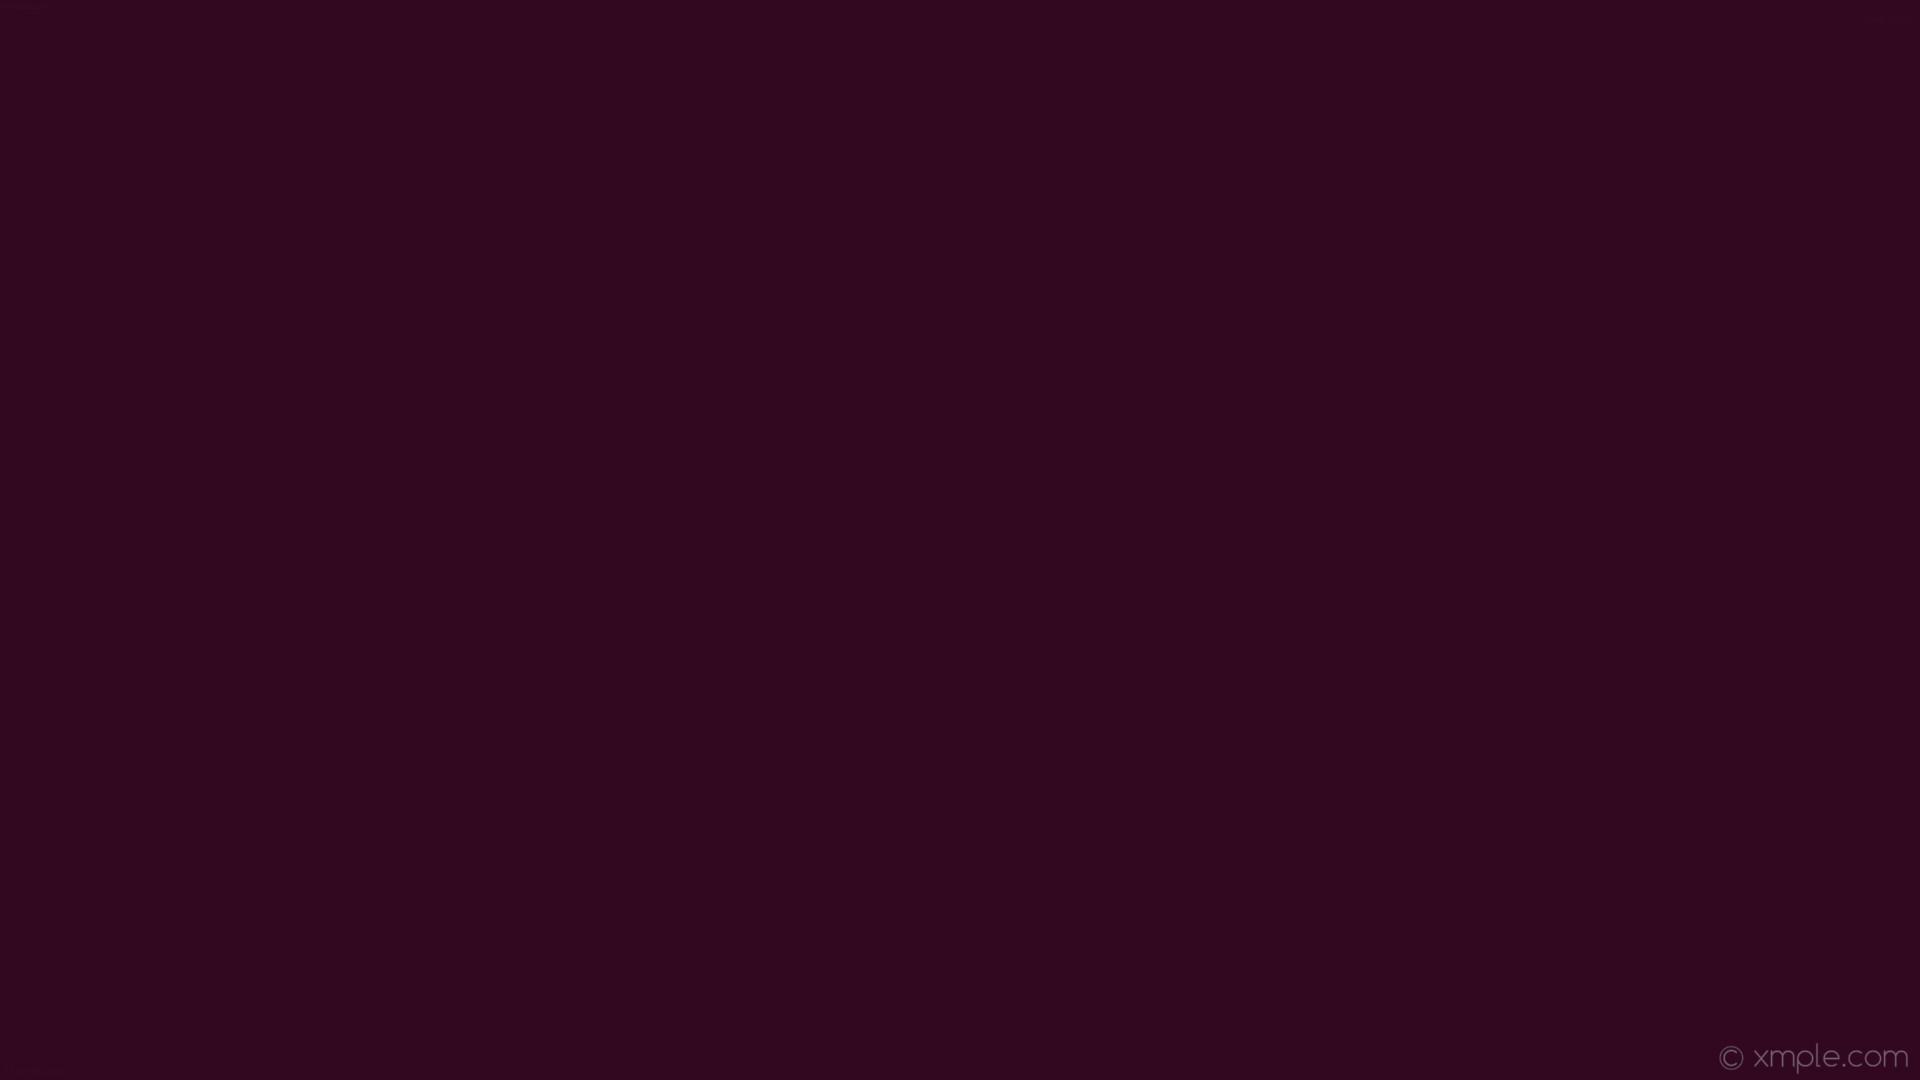 Dark Maroon Wallpaper (75+ images)